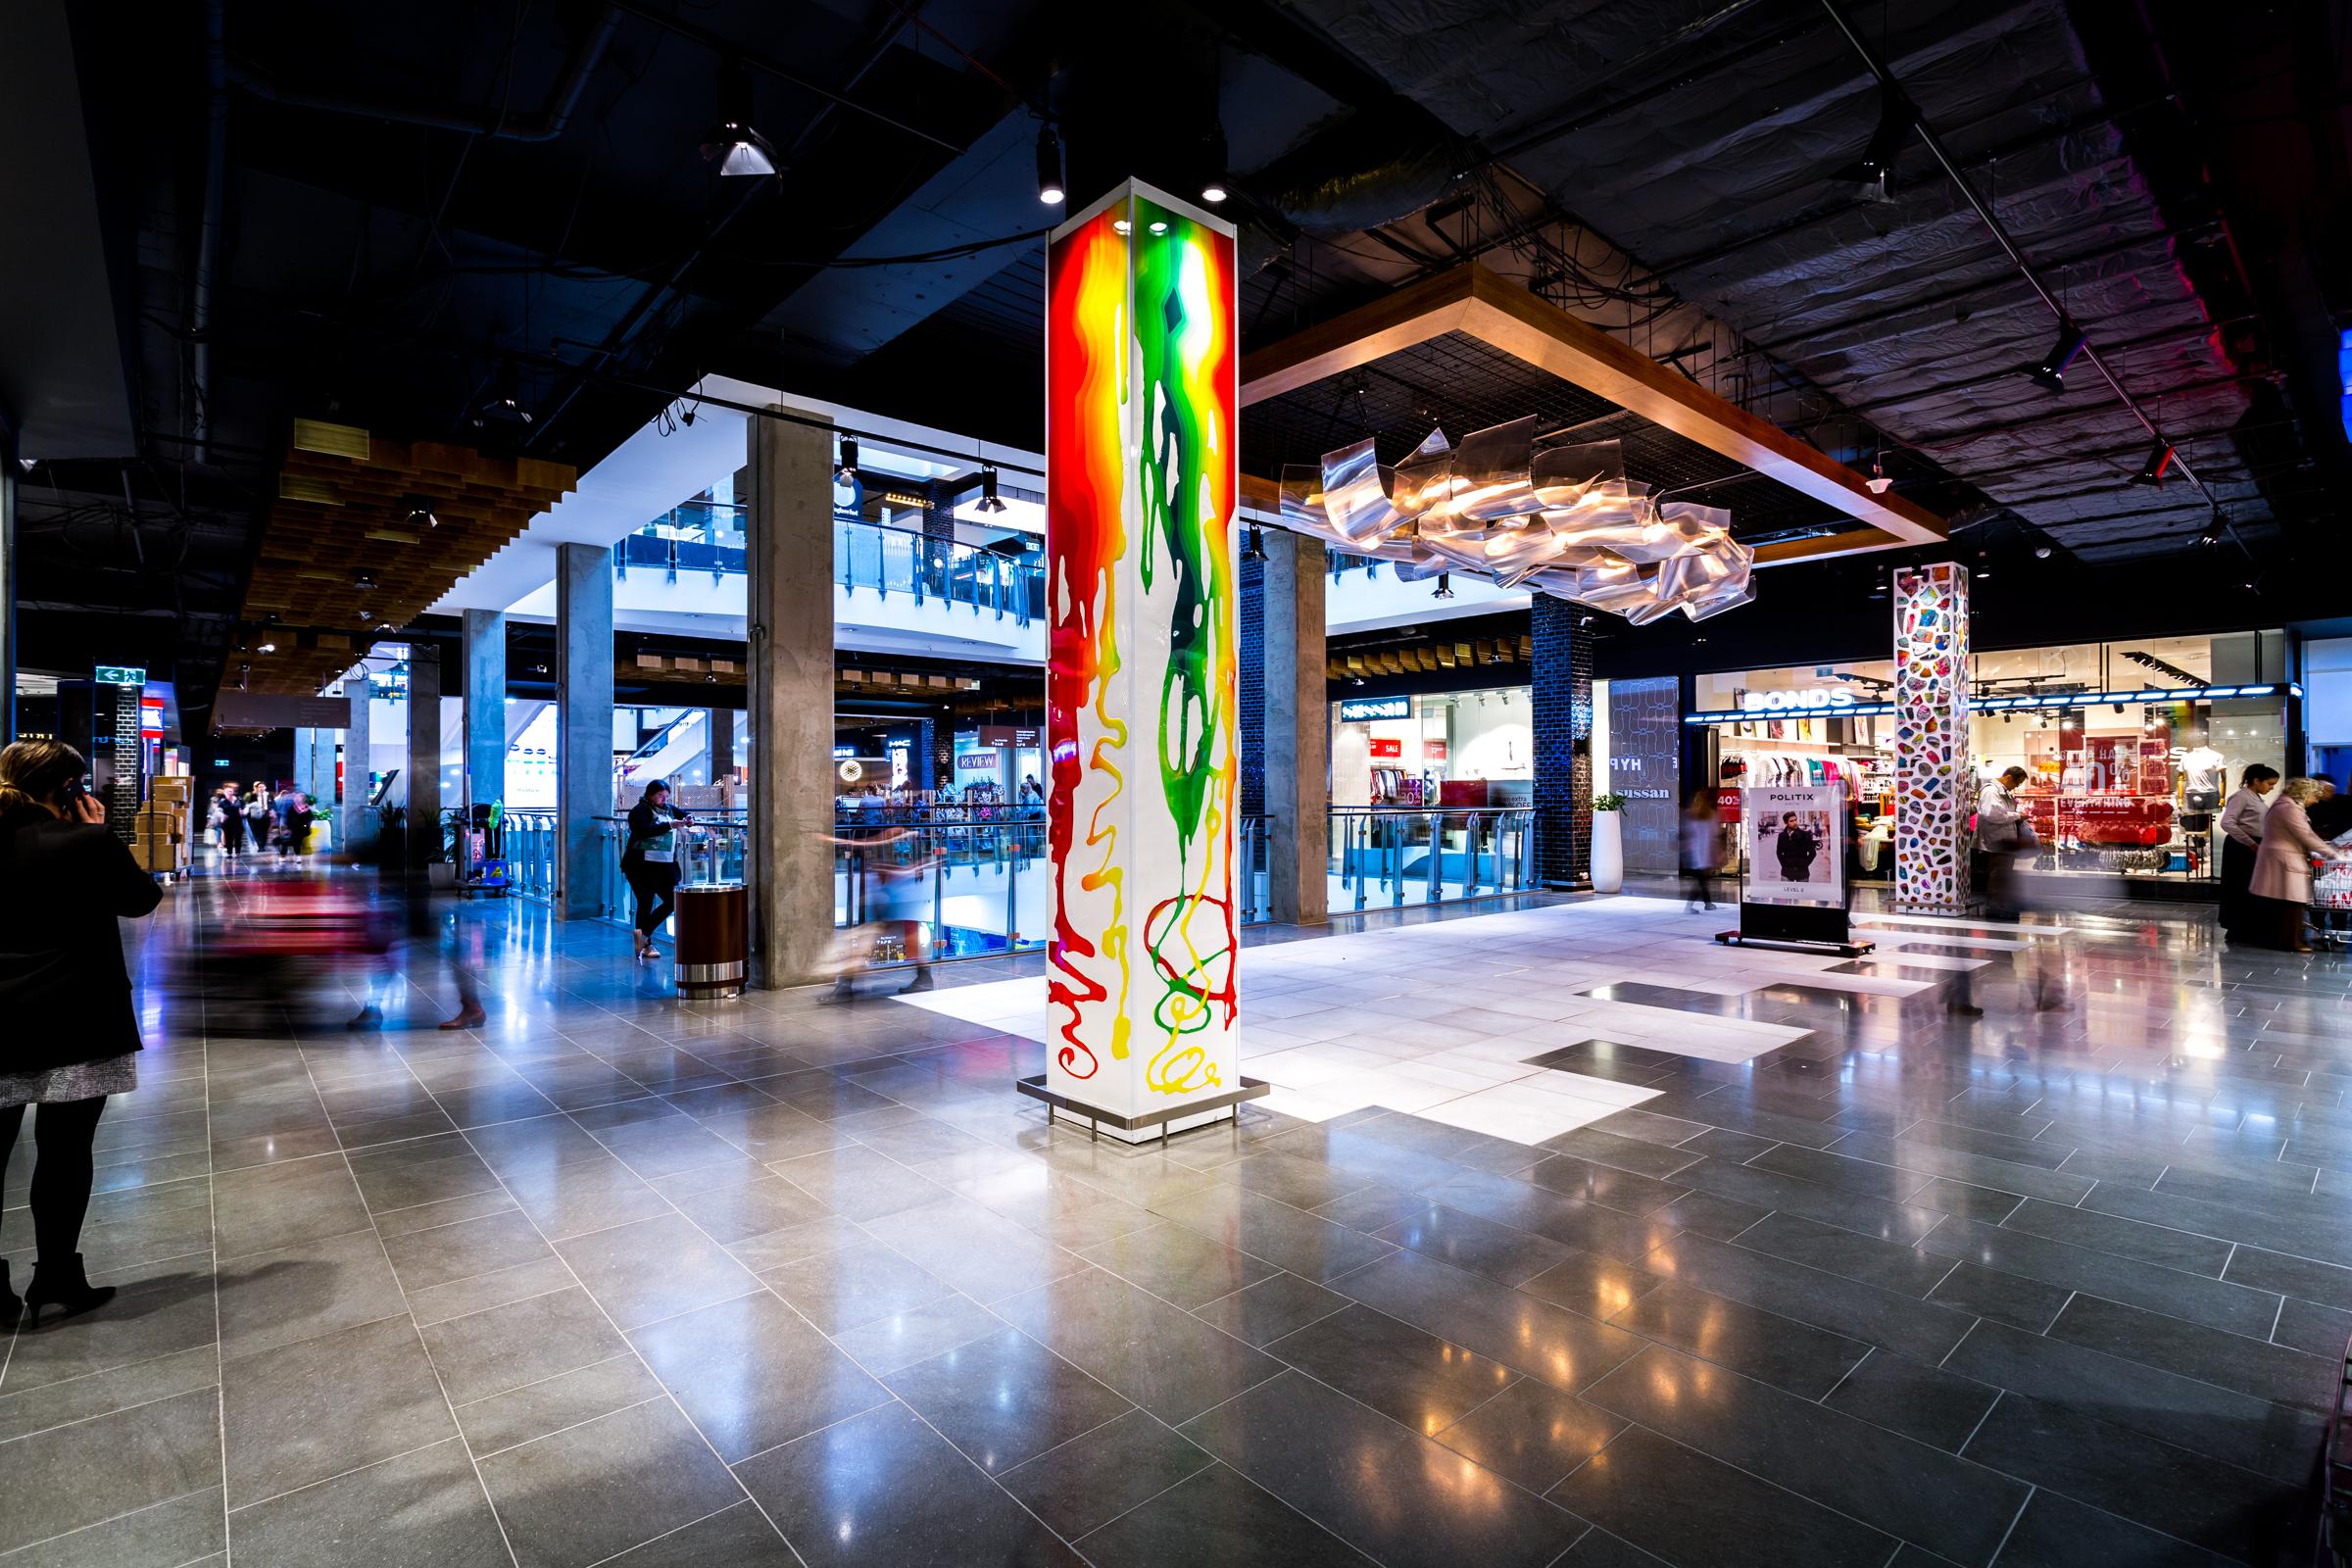 Art Pharmacy Consulting_Broadway Shopping Centre Columns-1.jpg